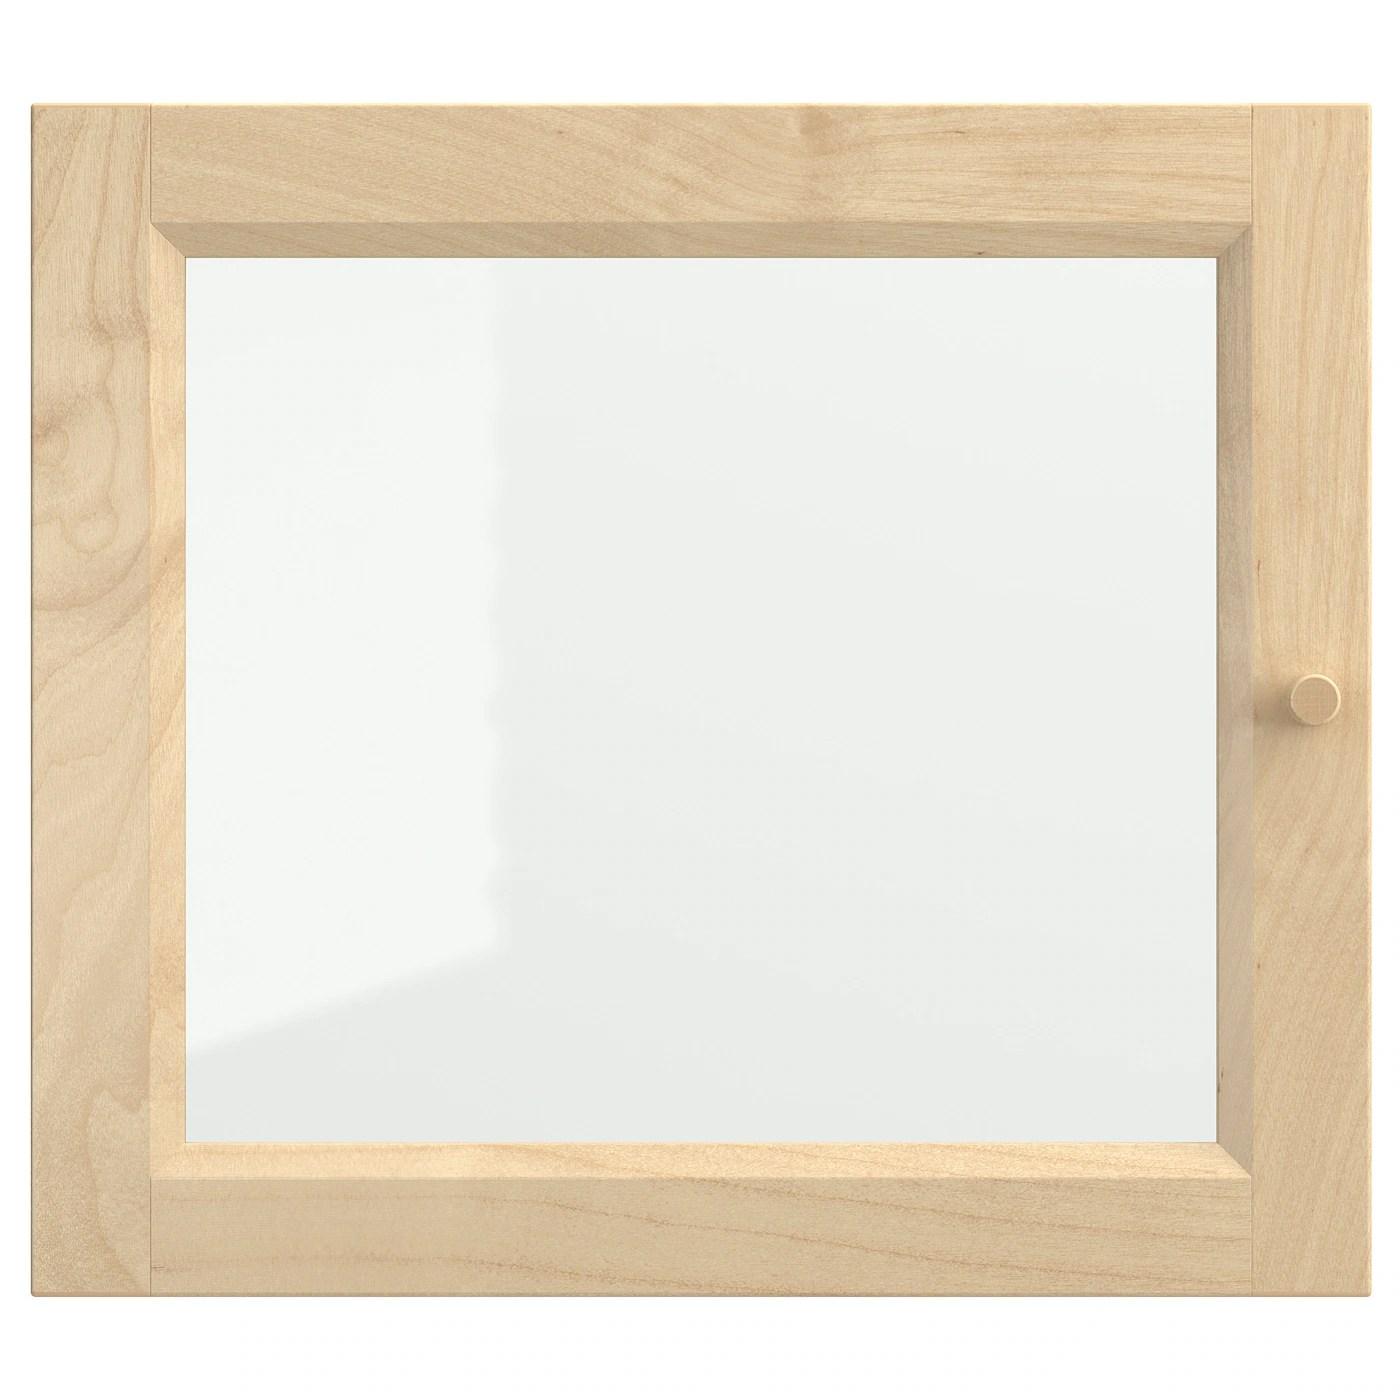 oxberg porte vitree bouleau plaque 15 3 4x13 3 4 40x35 cm